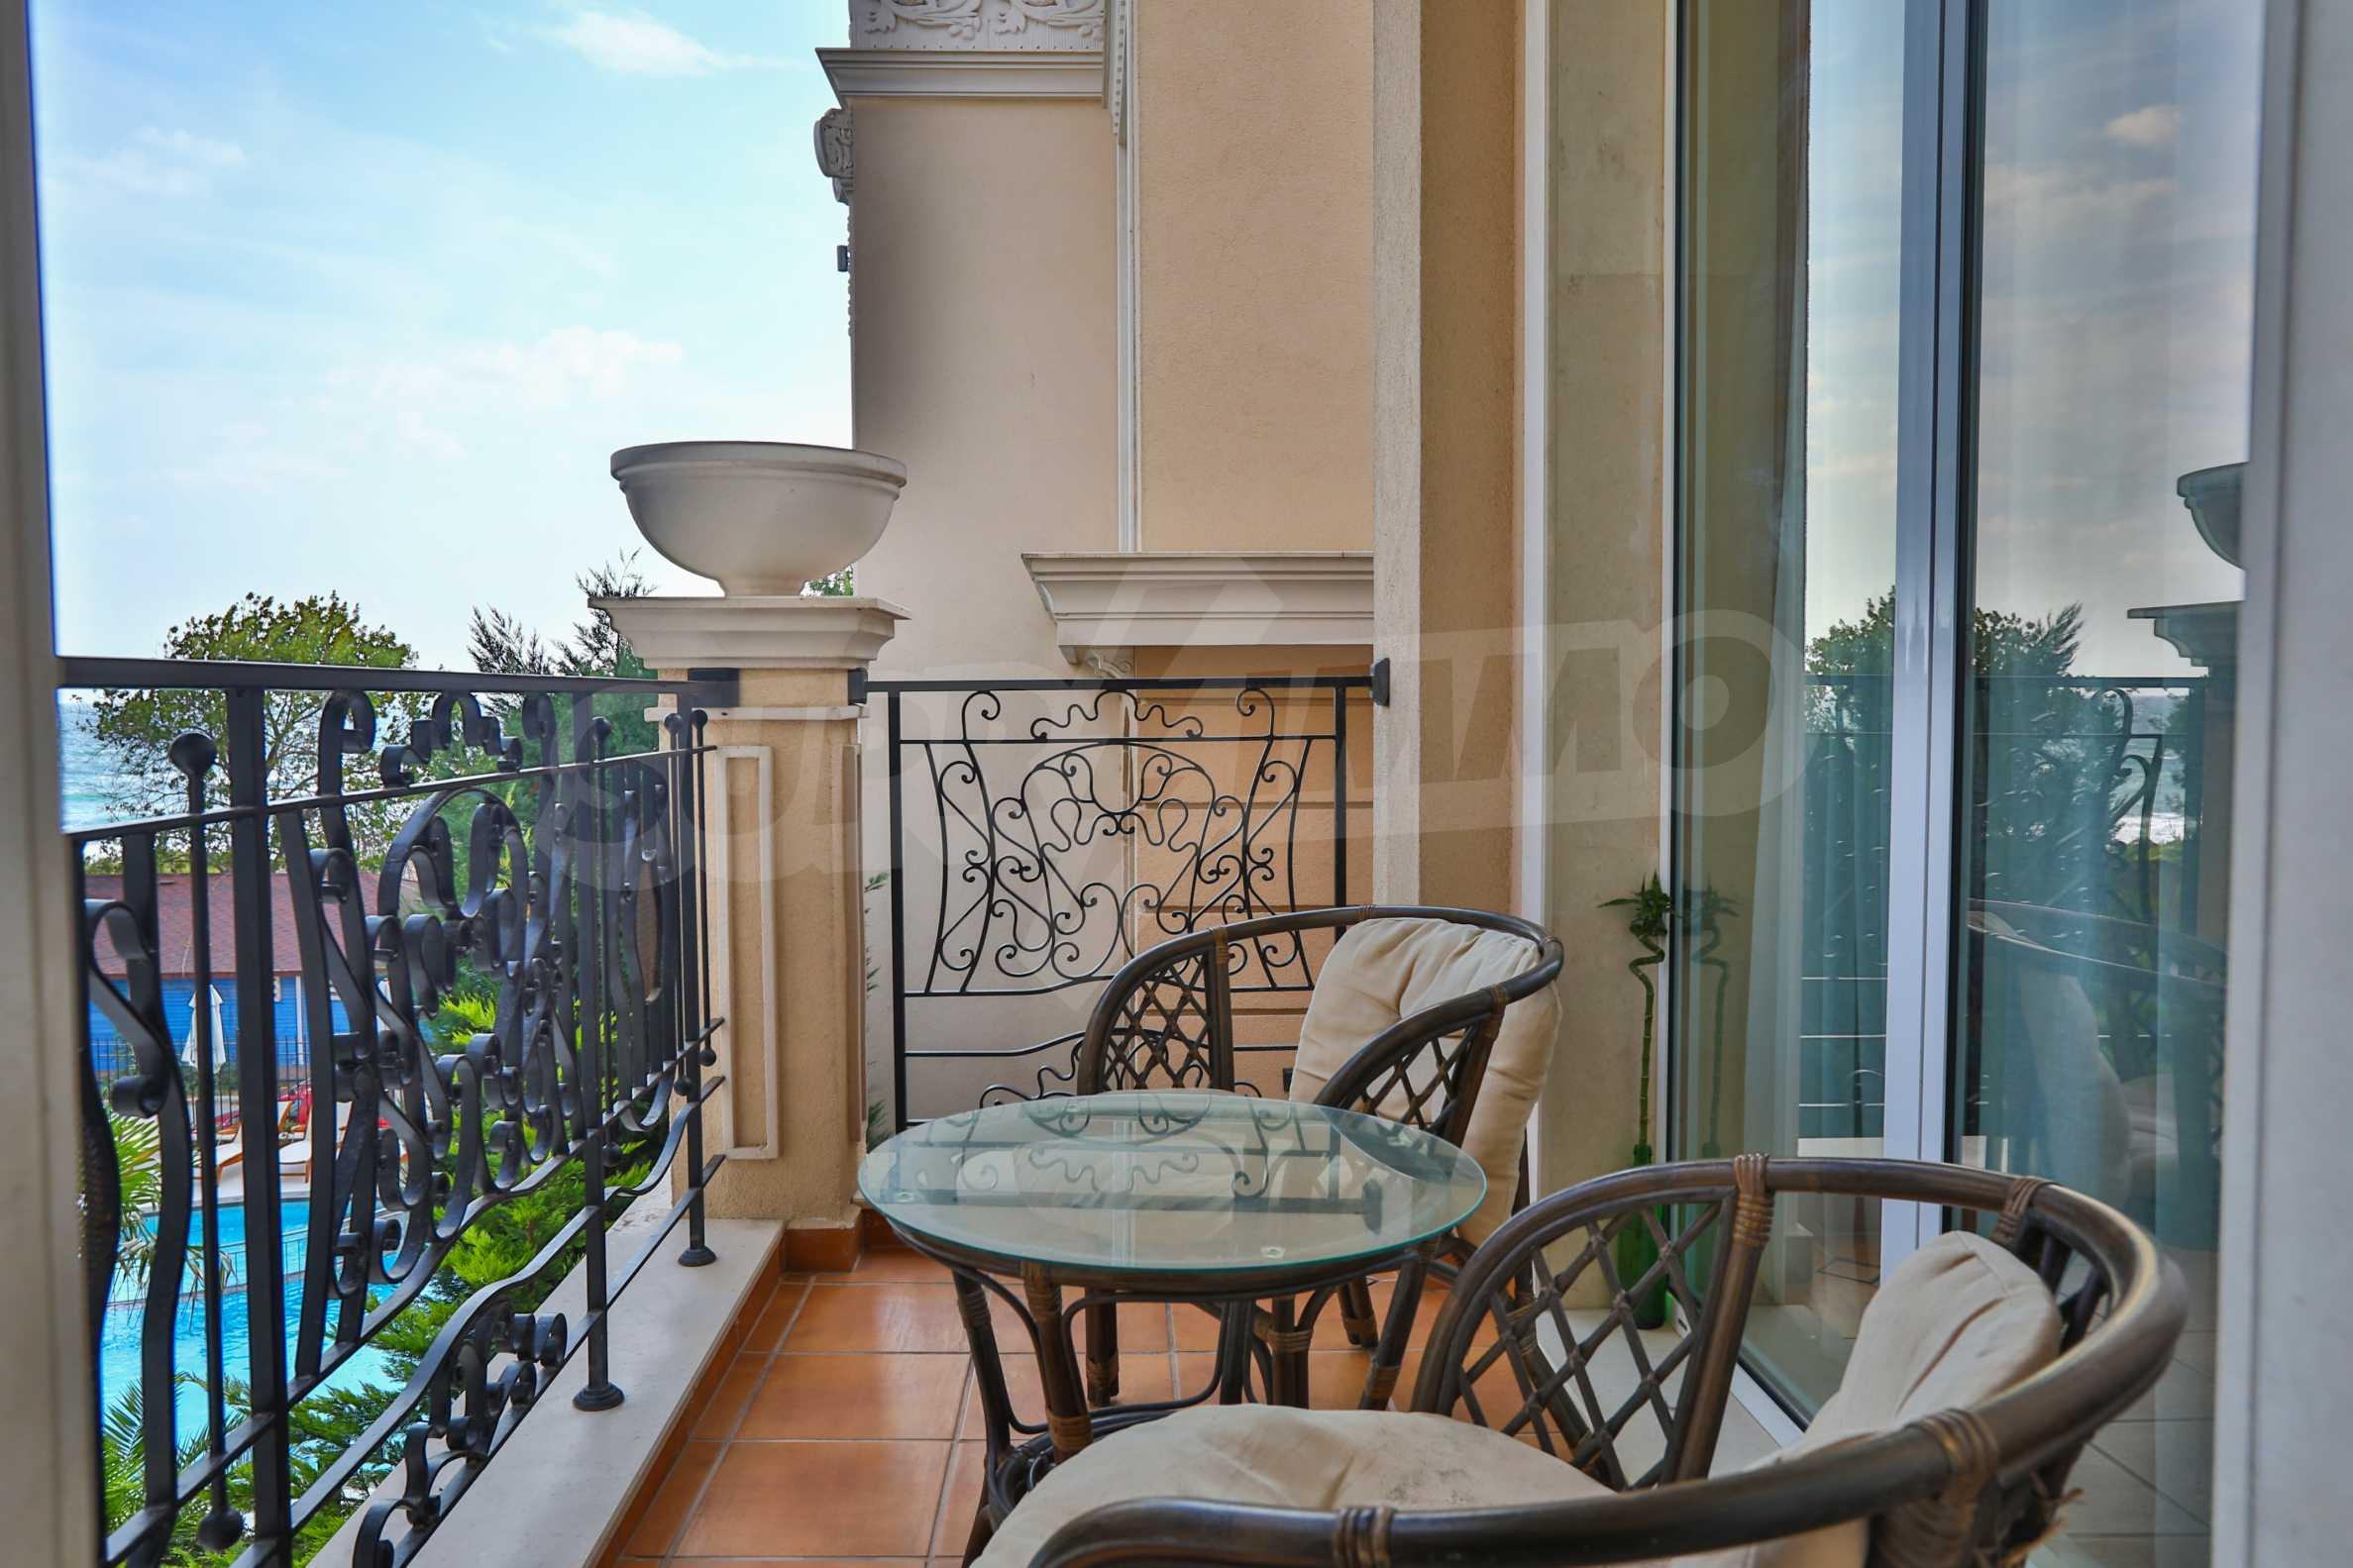 Exclusive 2-bedroom beachfront apartment in the prestigious Belle Époque Beach Residence 10